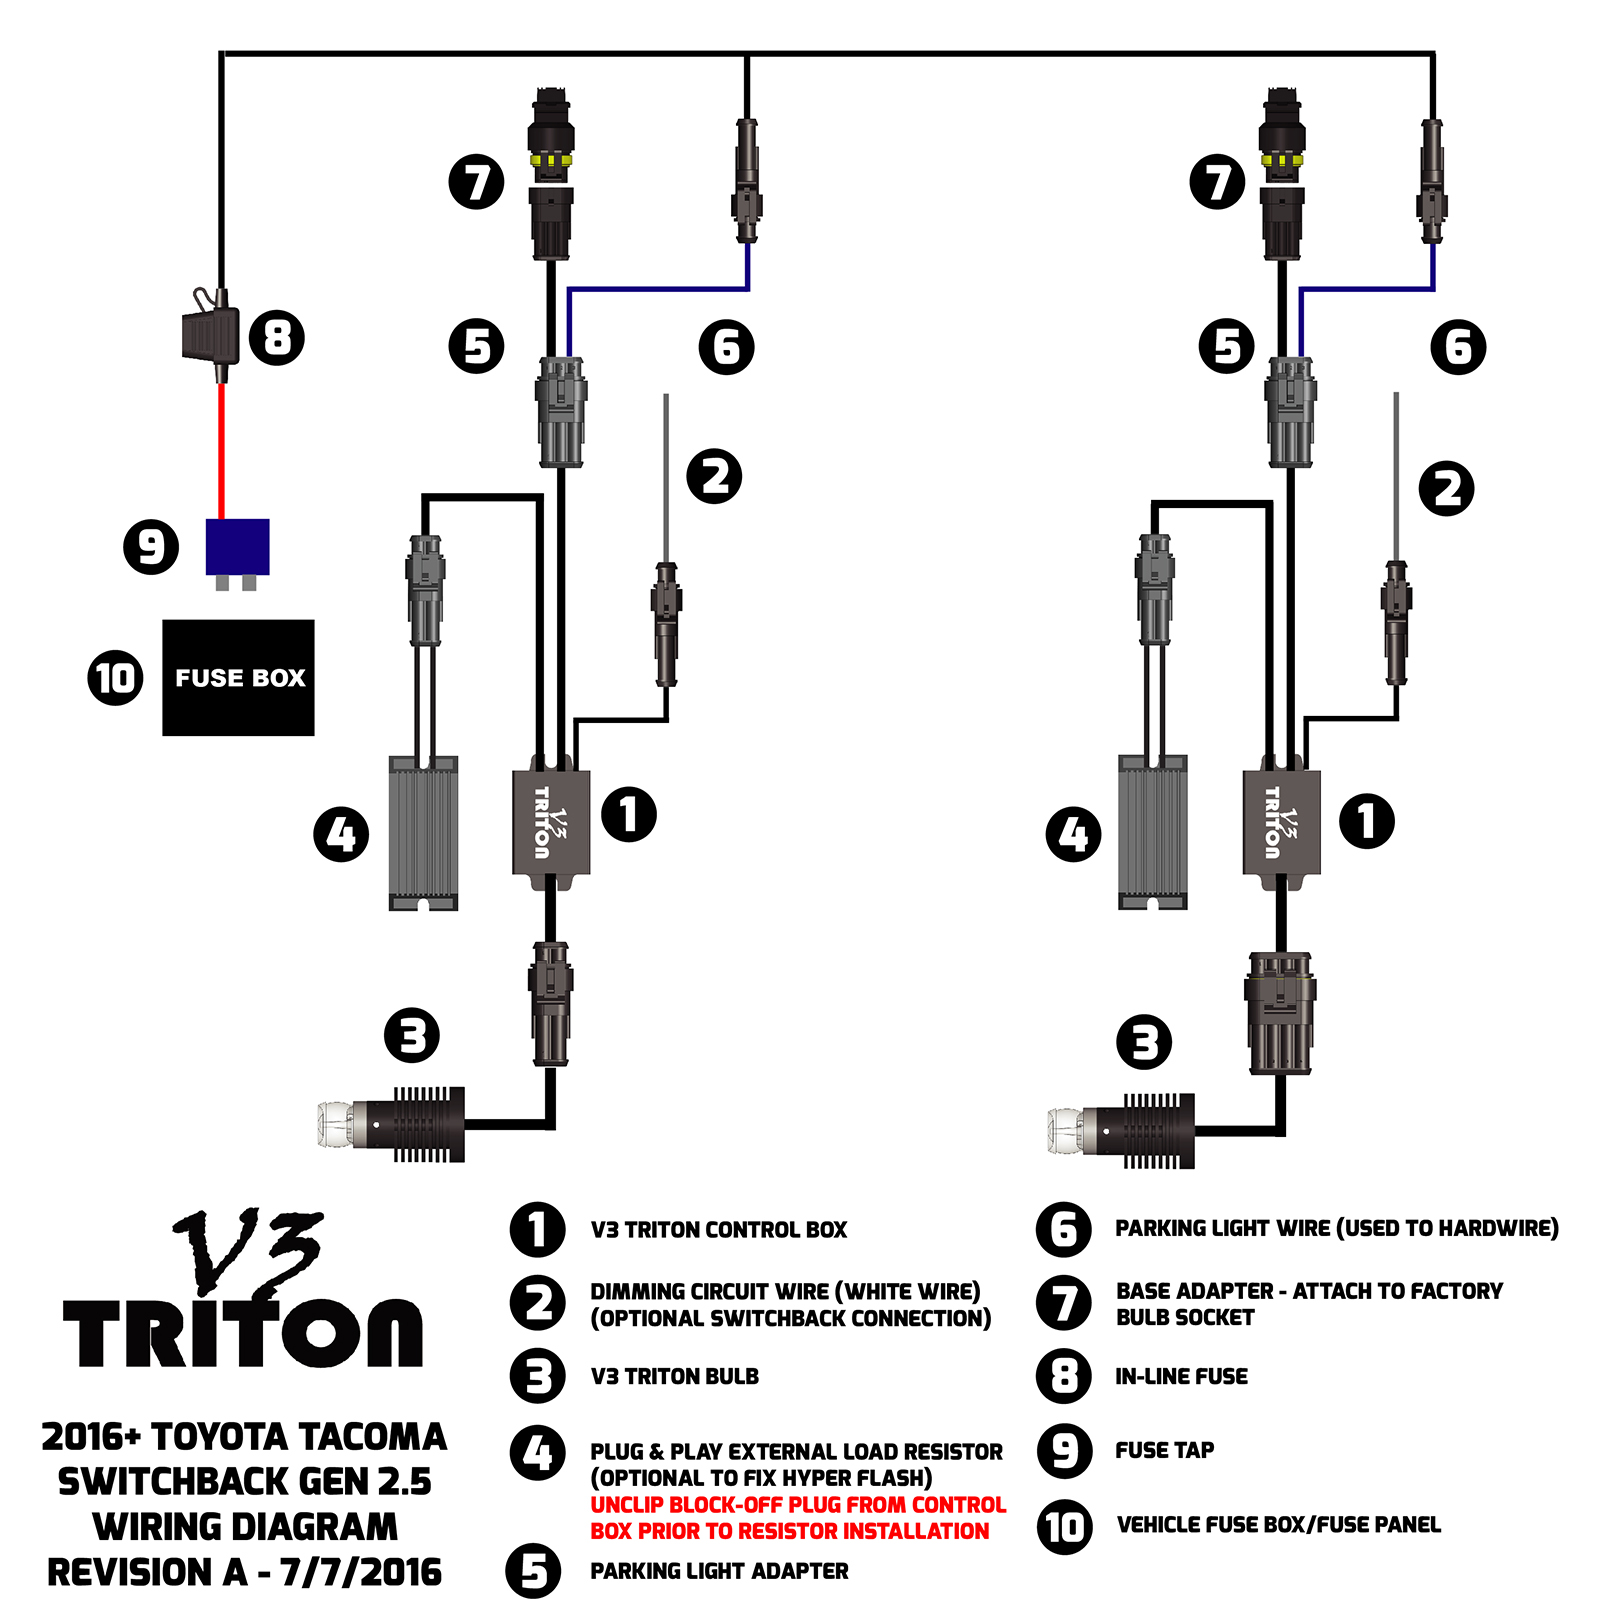 2016 toyota tundra radio wiring diagram stop start single phase tacoma 33